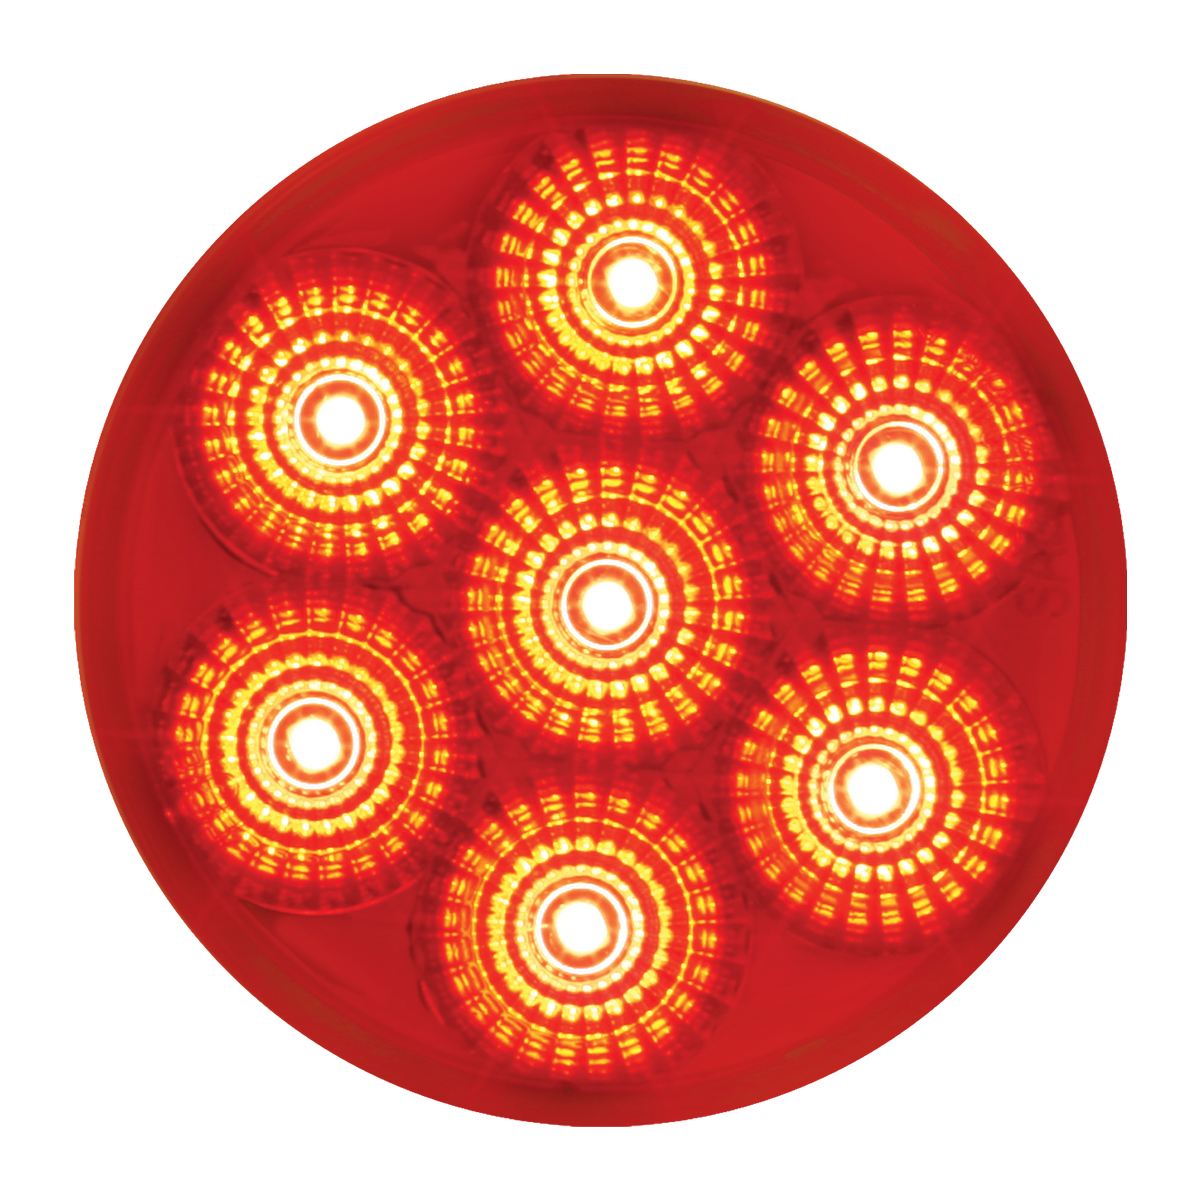 "76662 2-1/2"" Spyder LED Marker Light"